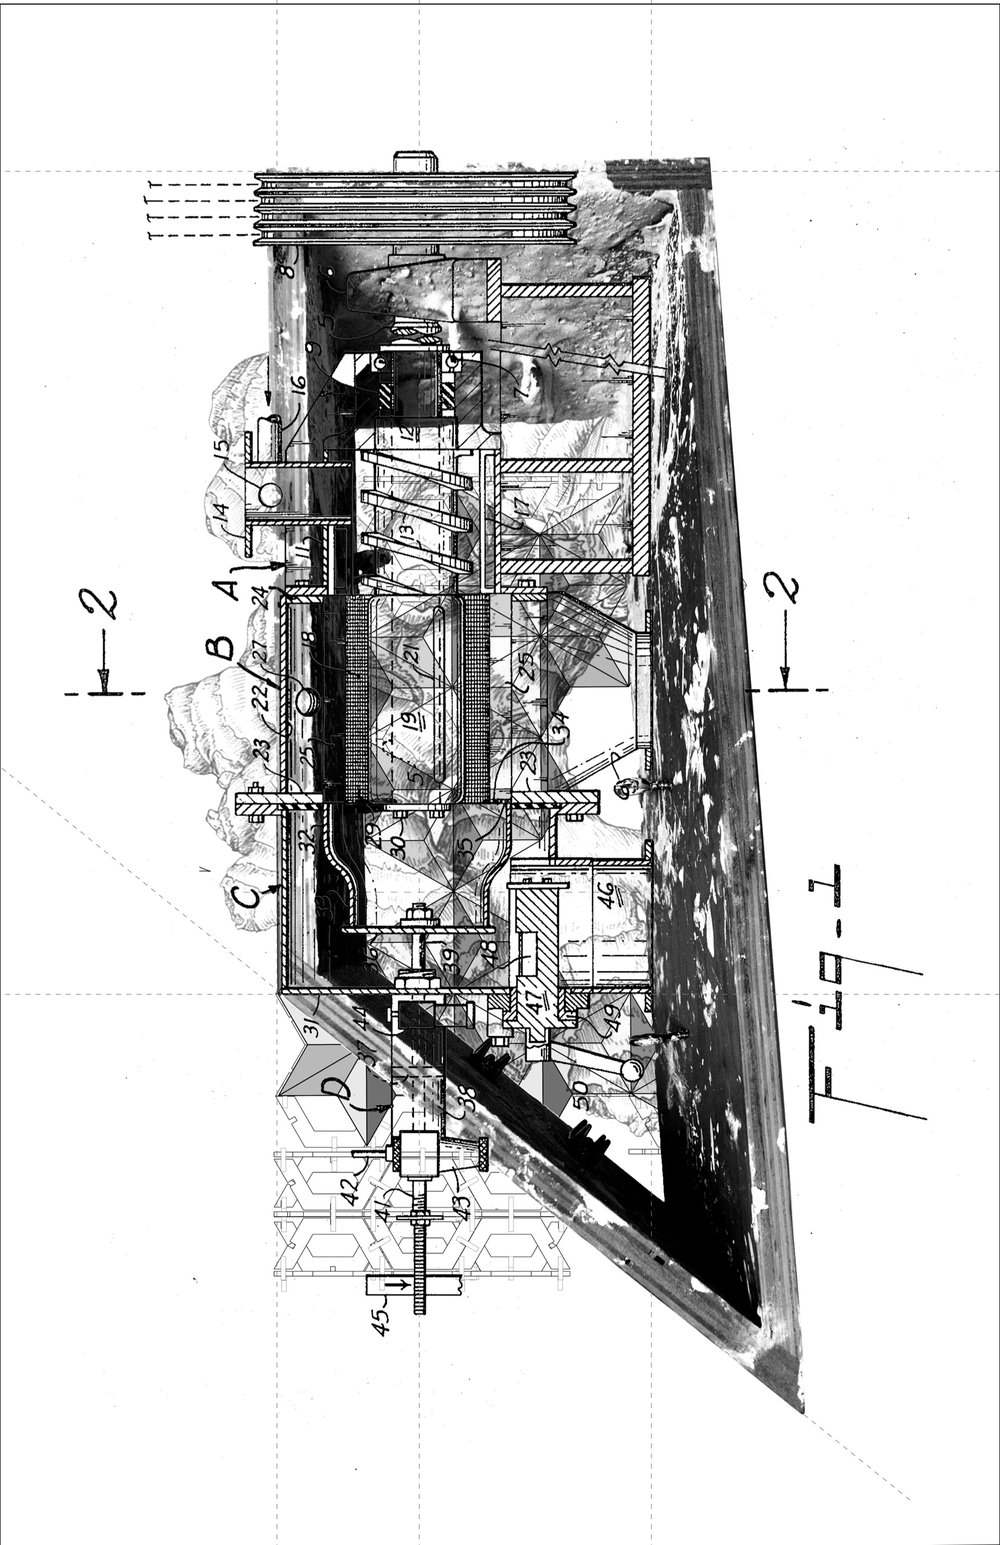 B.1_Ideogram Plan.jpg